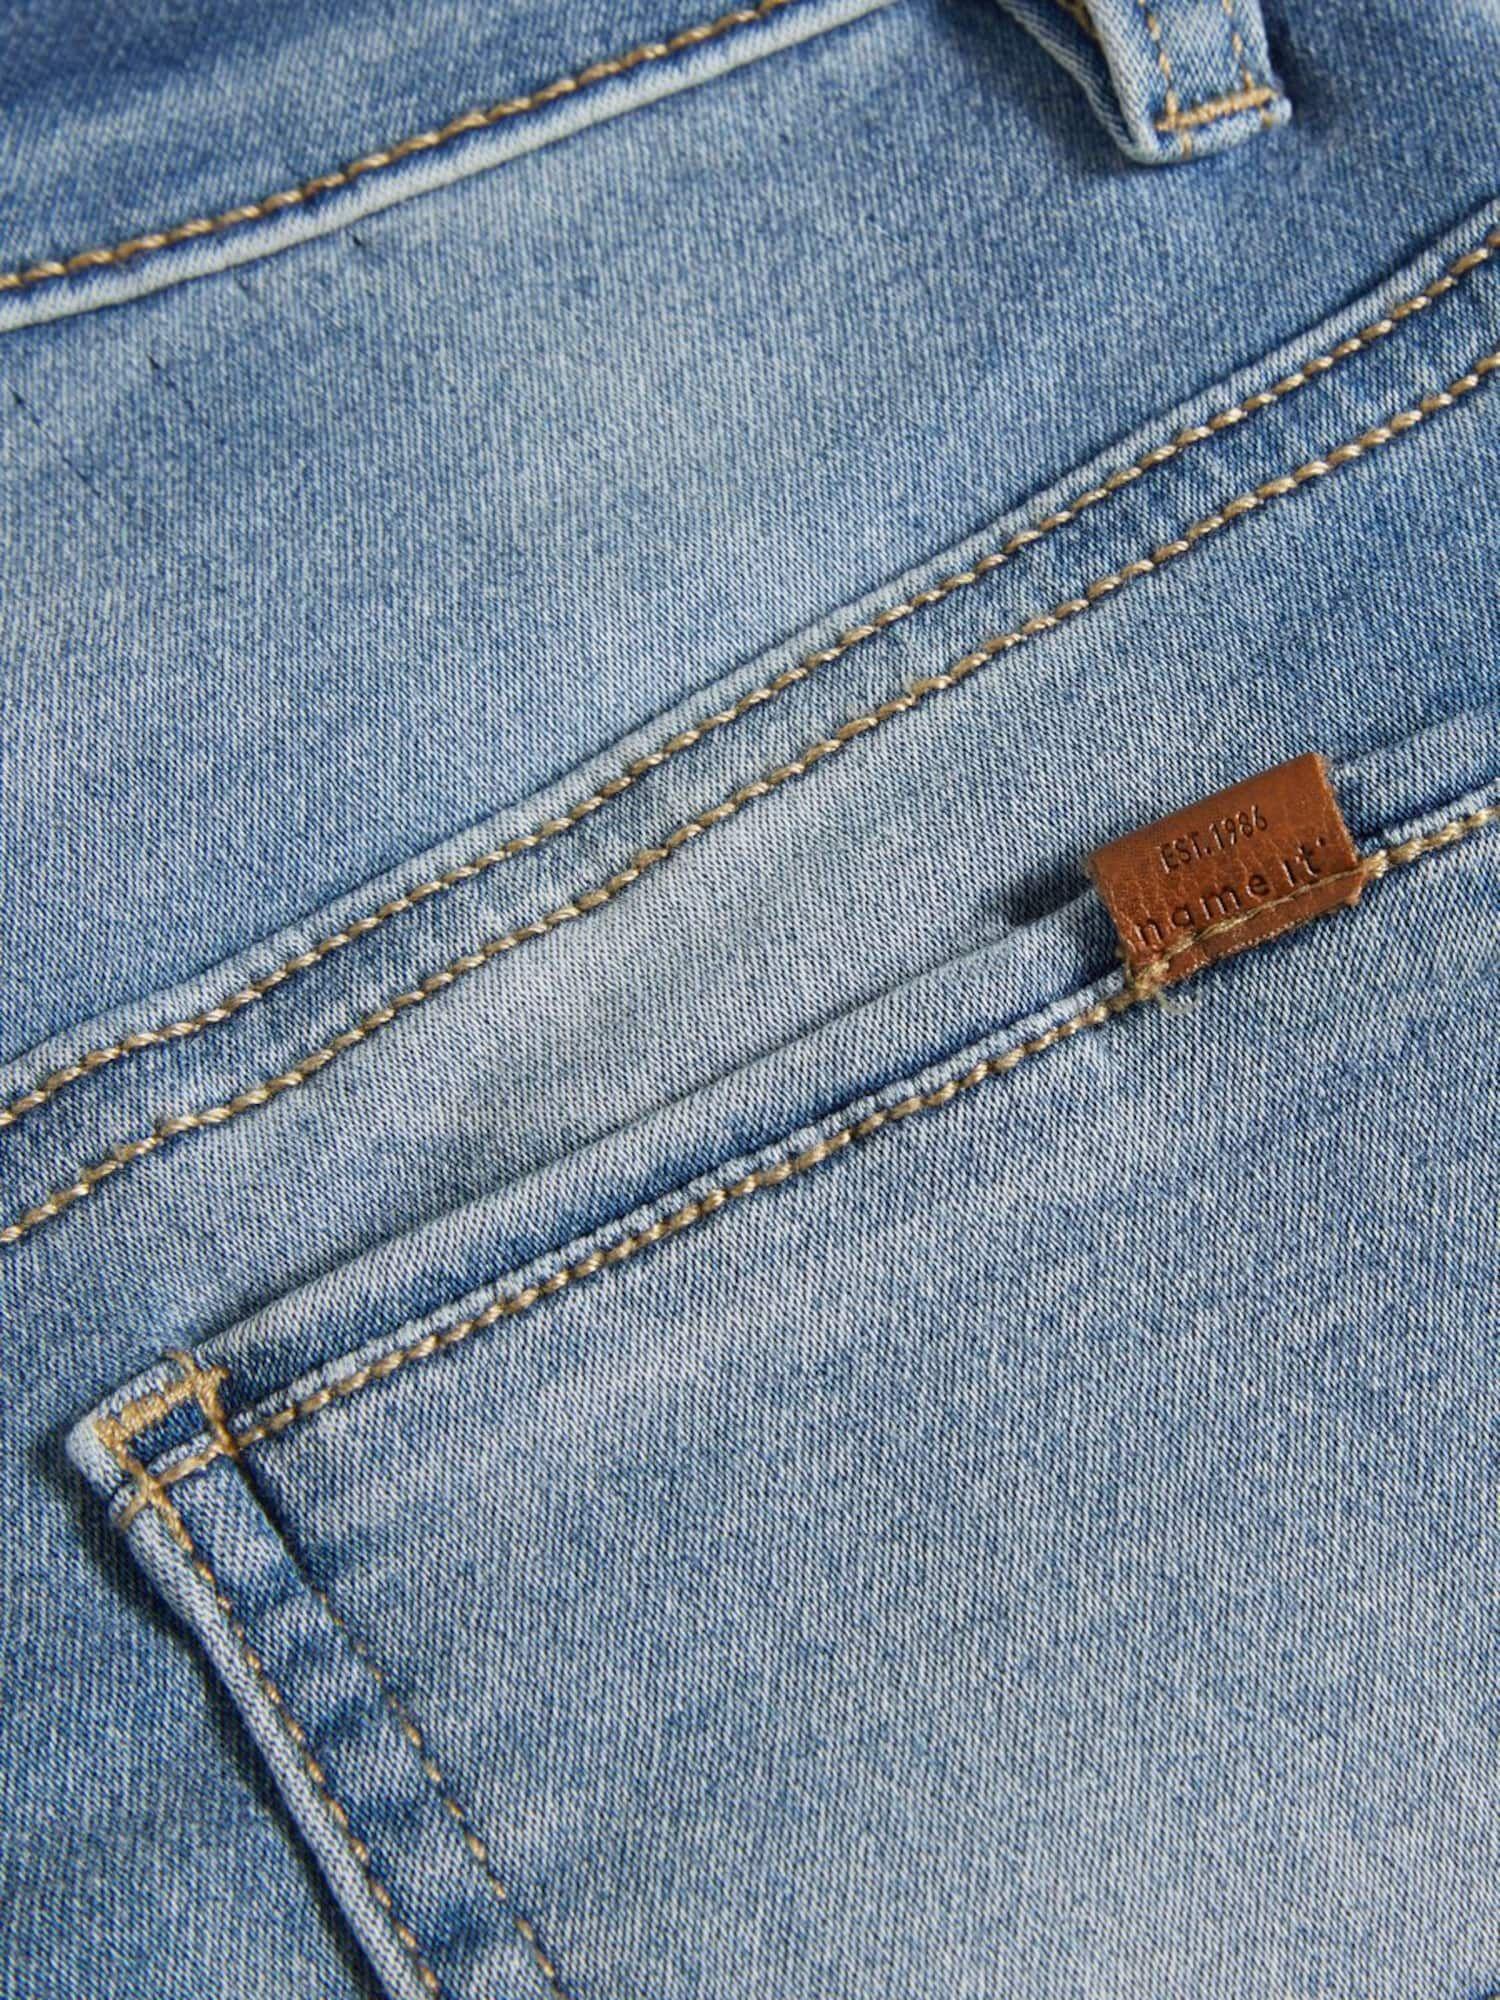 Name It Jeans Nkmtheo Dnmthayer 1166 Swe Jungen Blue Denim Grosse 128 Kinder Jeans Jeans Und Denim Jeans